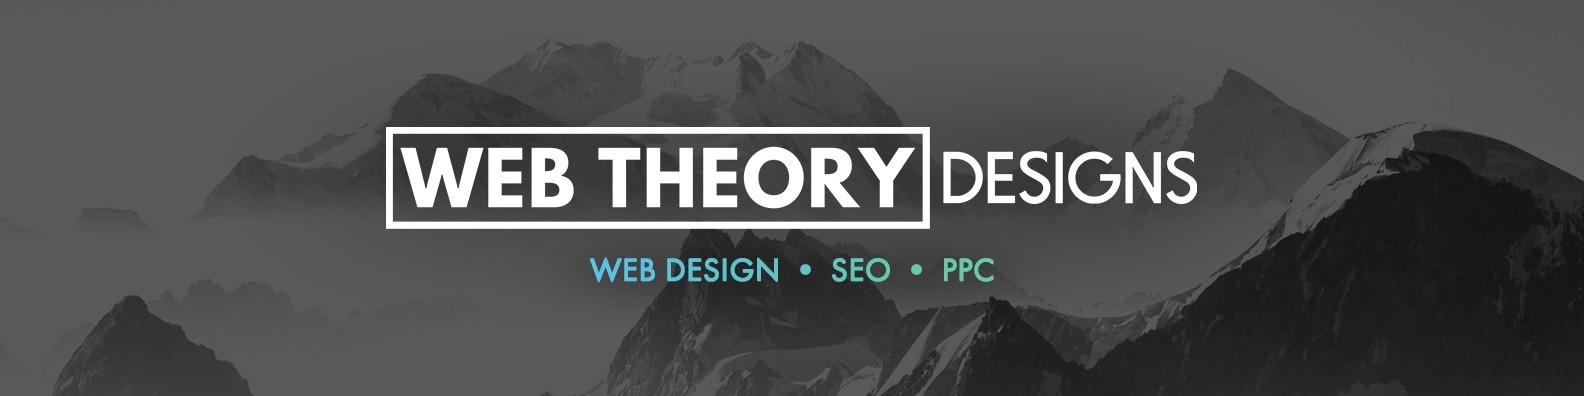 Web Theory Designs (@webtheorydesign) Cover Image